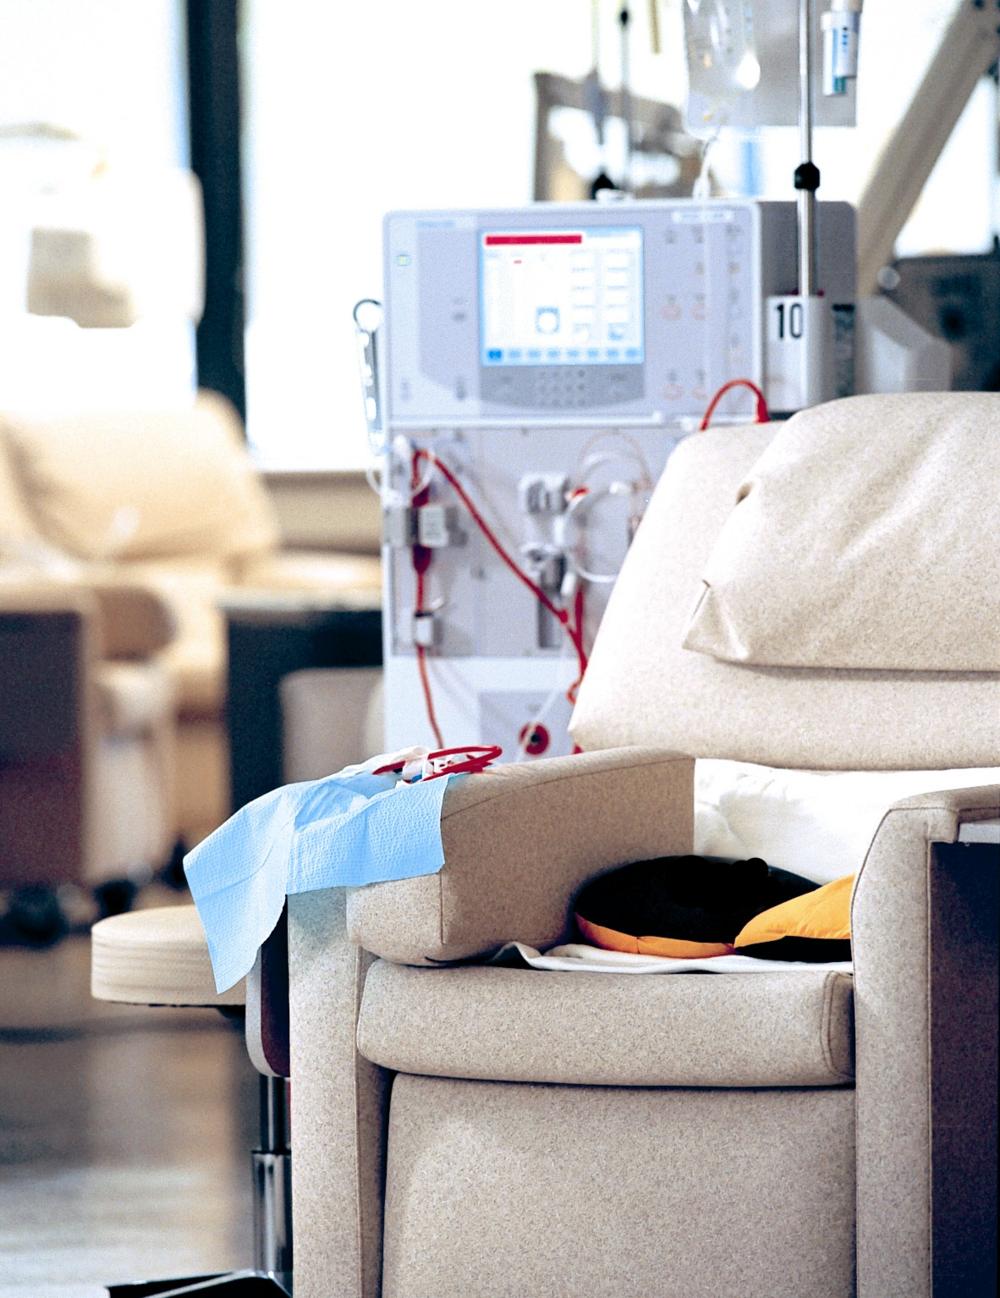 dialysis chair_C.F.-06.21.13.jpg